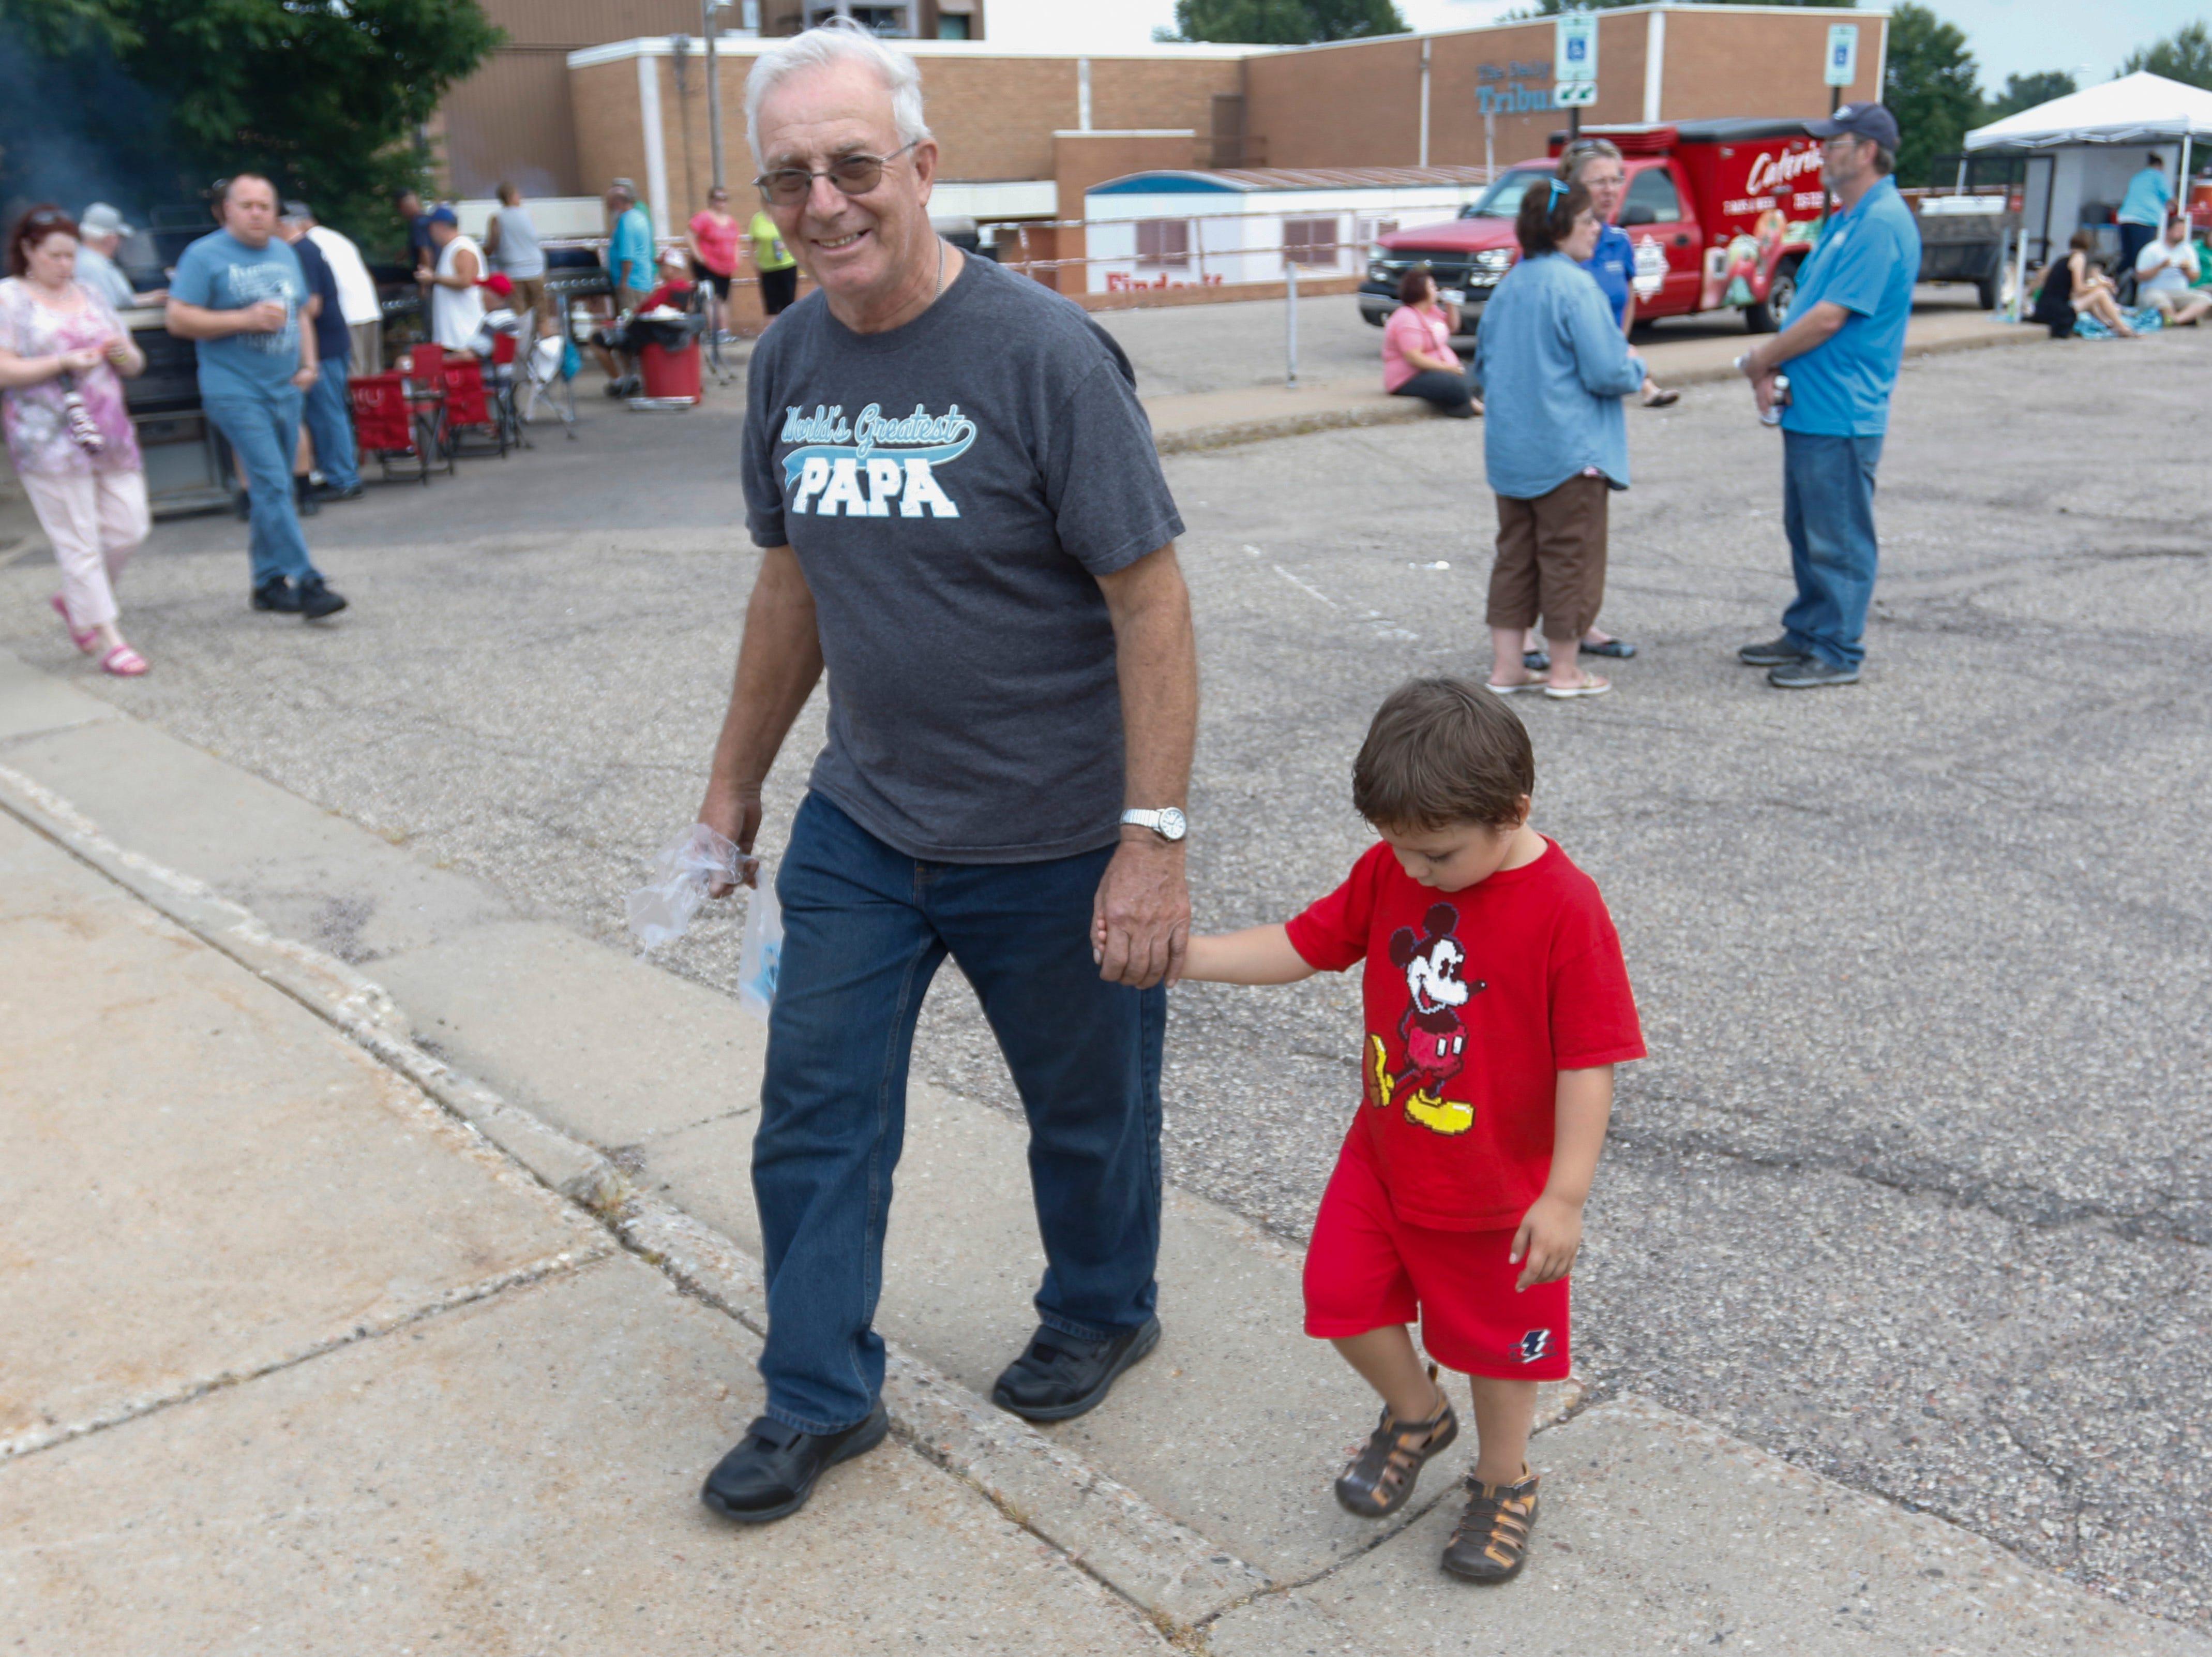 Grandpa Al Zurkowski walks with his grandson Joshua Zurkowski, 3, at the Wisconsin Rapids community picnic on First Avenue South and Johnson Street Wednesday, August 1, 2018.